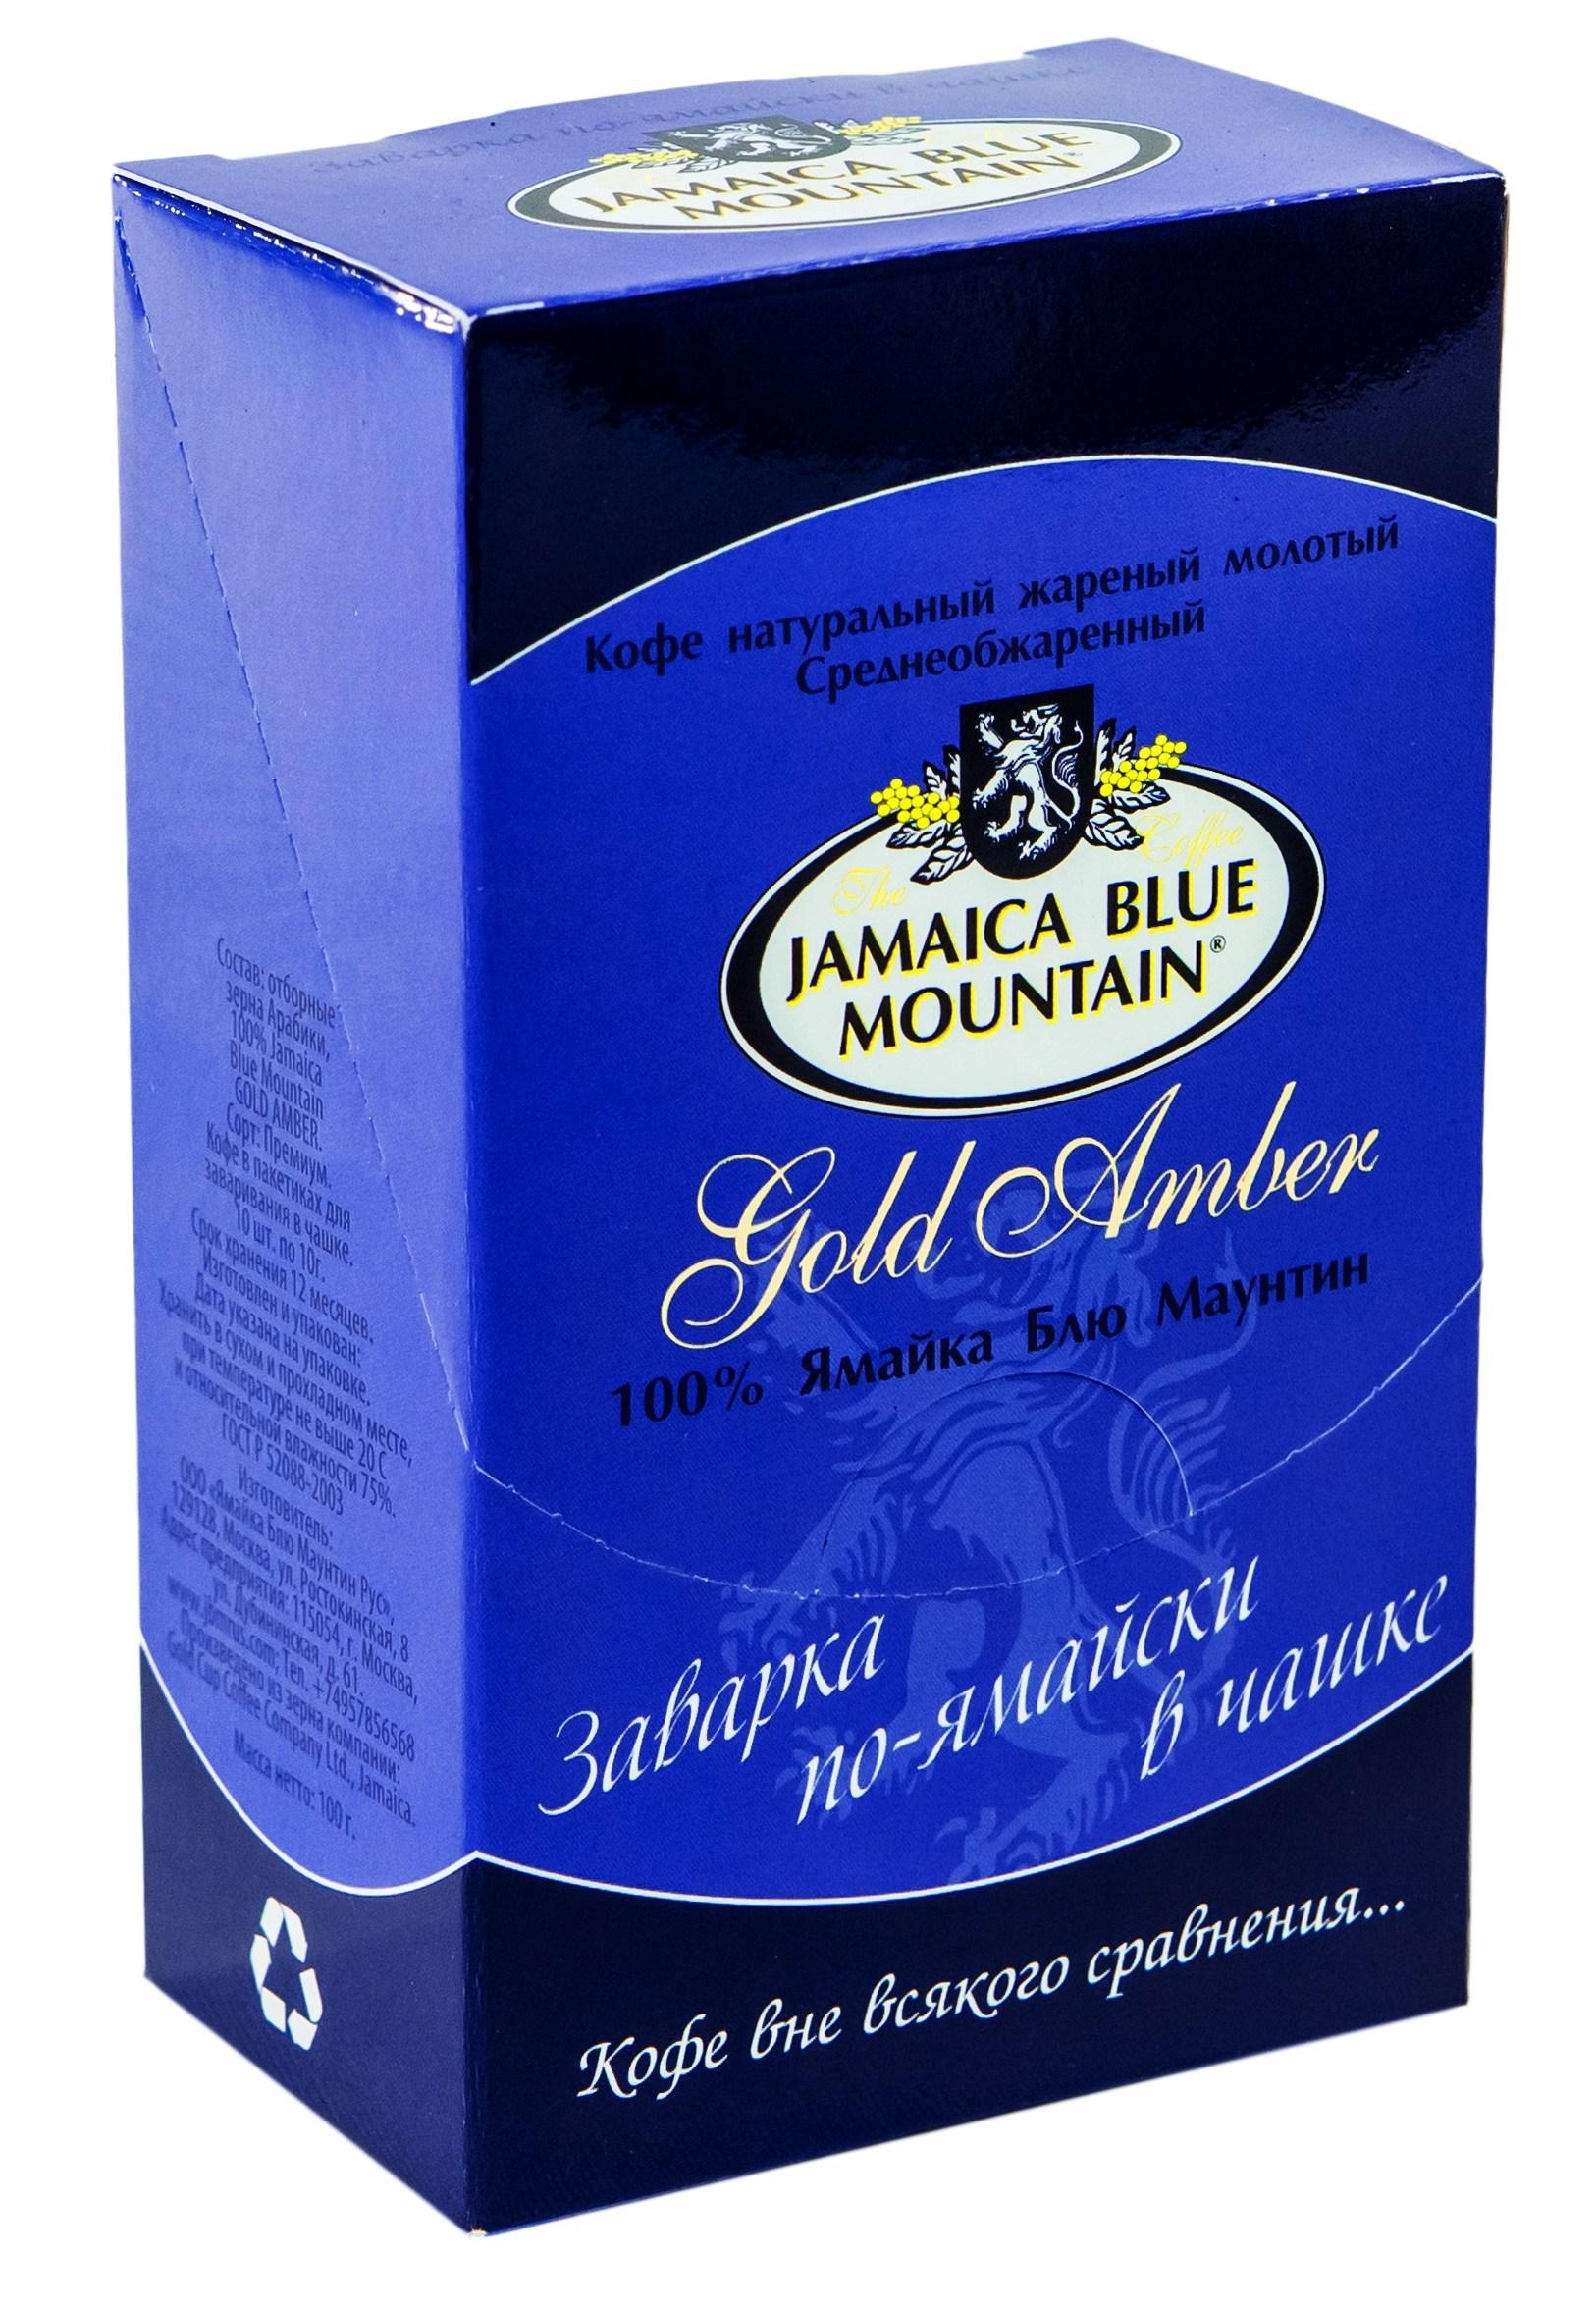 Кофе Ямайка Блю Маунтин Gold Amber, молотый, 10x10 г, (100 г)